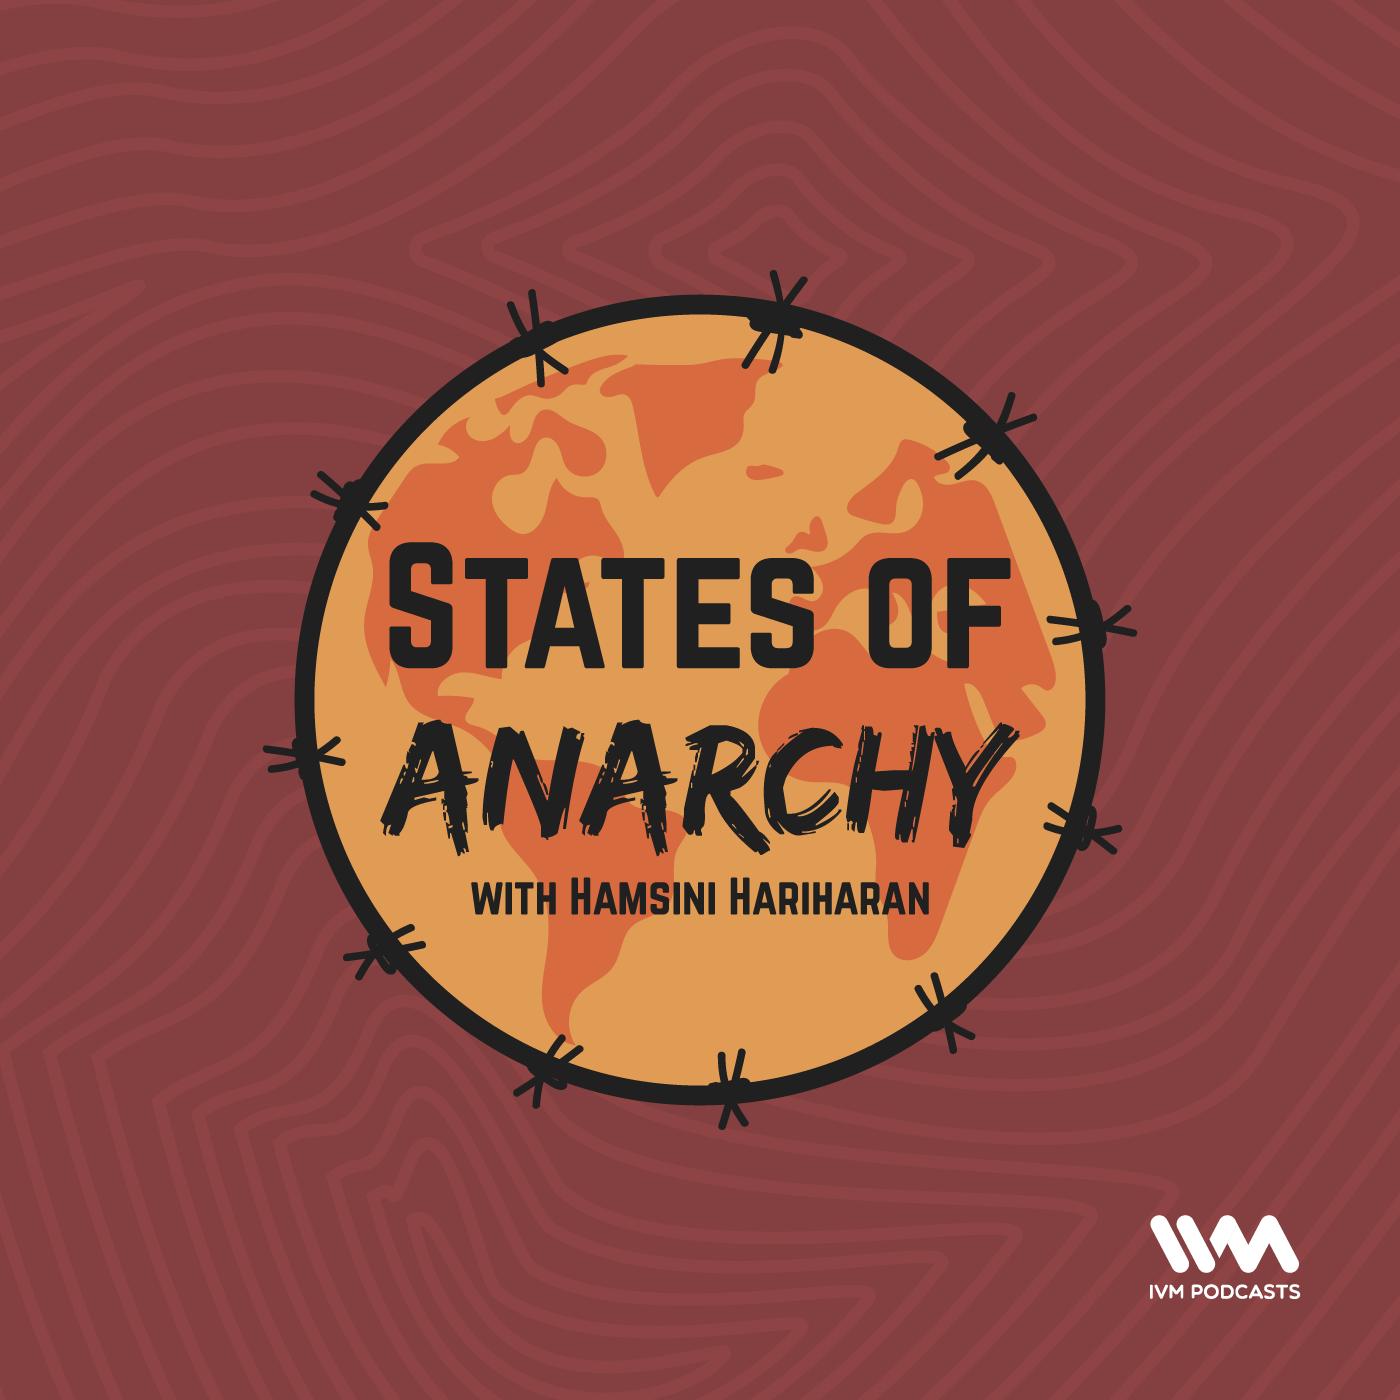 States of Anarchy with Hamsini Hariharan |